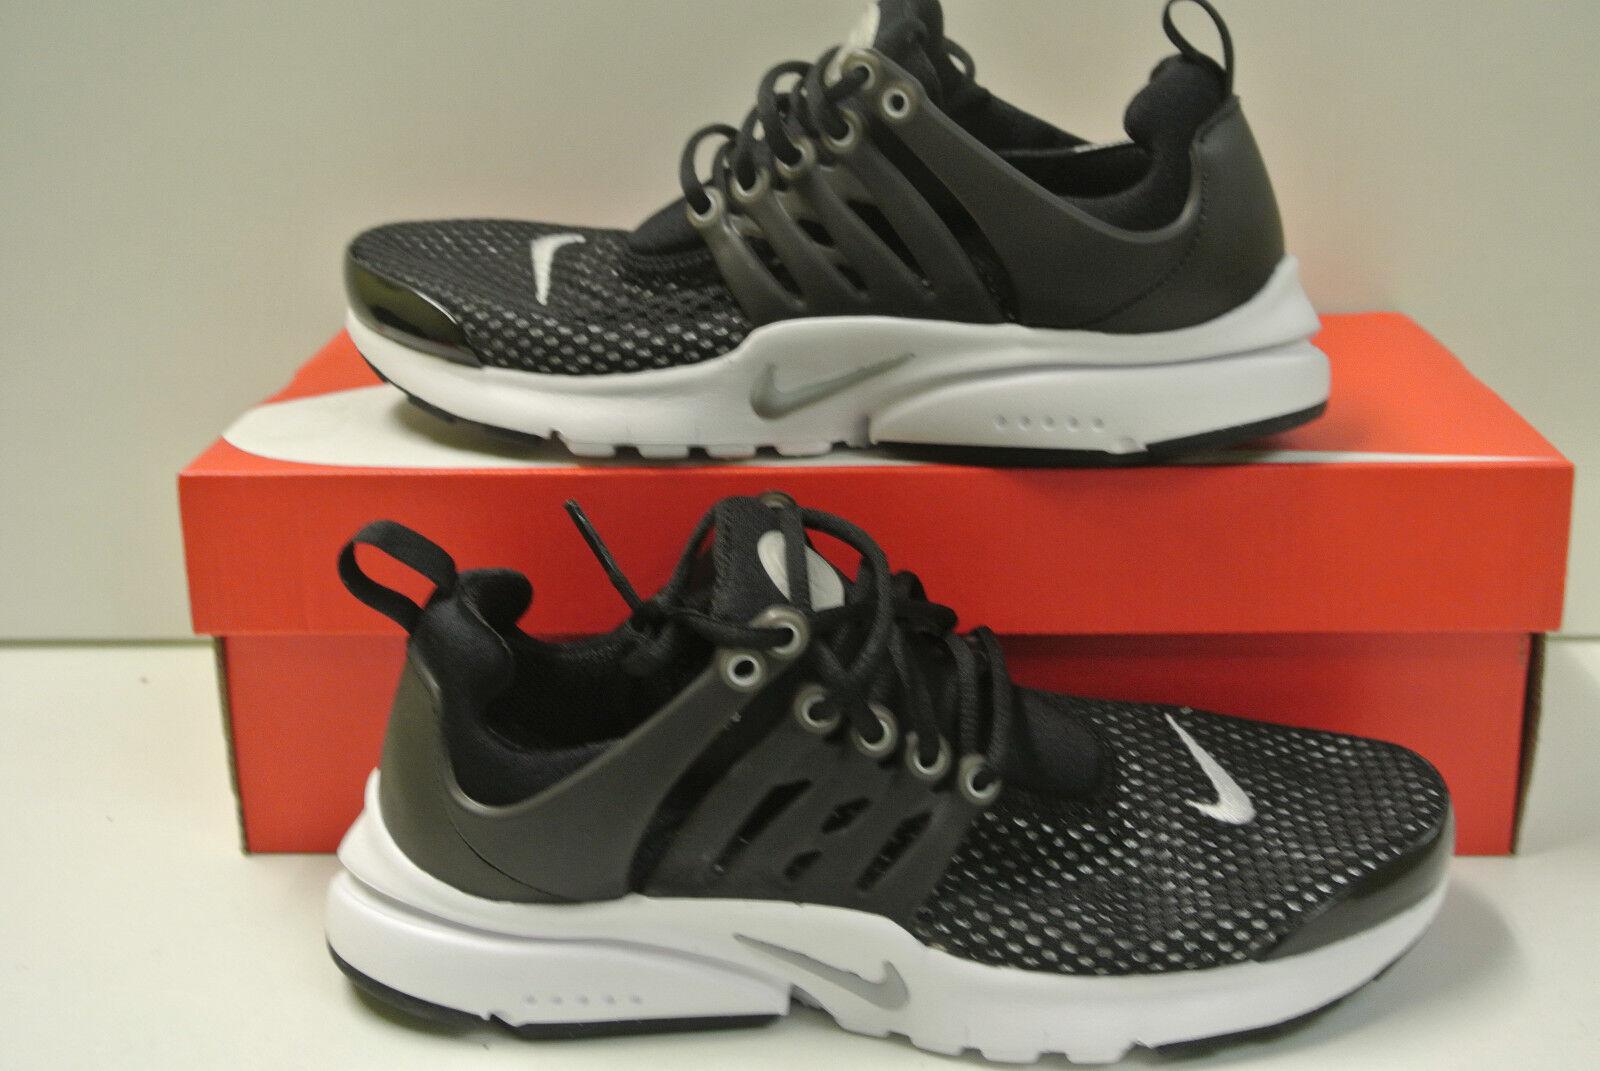 Nike Air Presto gr. SÉLECTIONNABLE neuf et emballage d'origine 832250 001